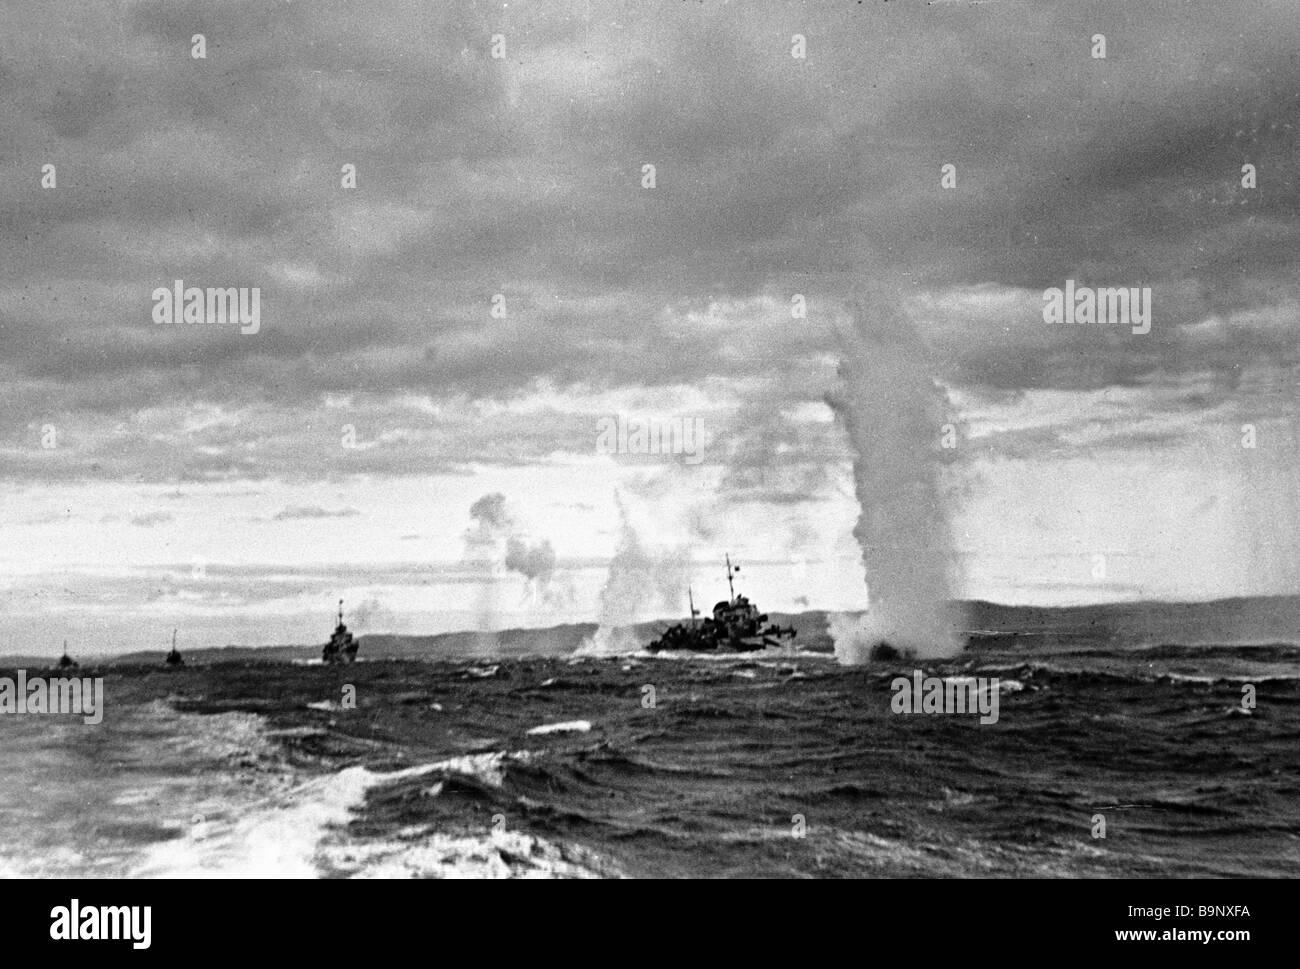 Soviet Ship Stock Photos & Soviet Ship Stock Images - Alamy